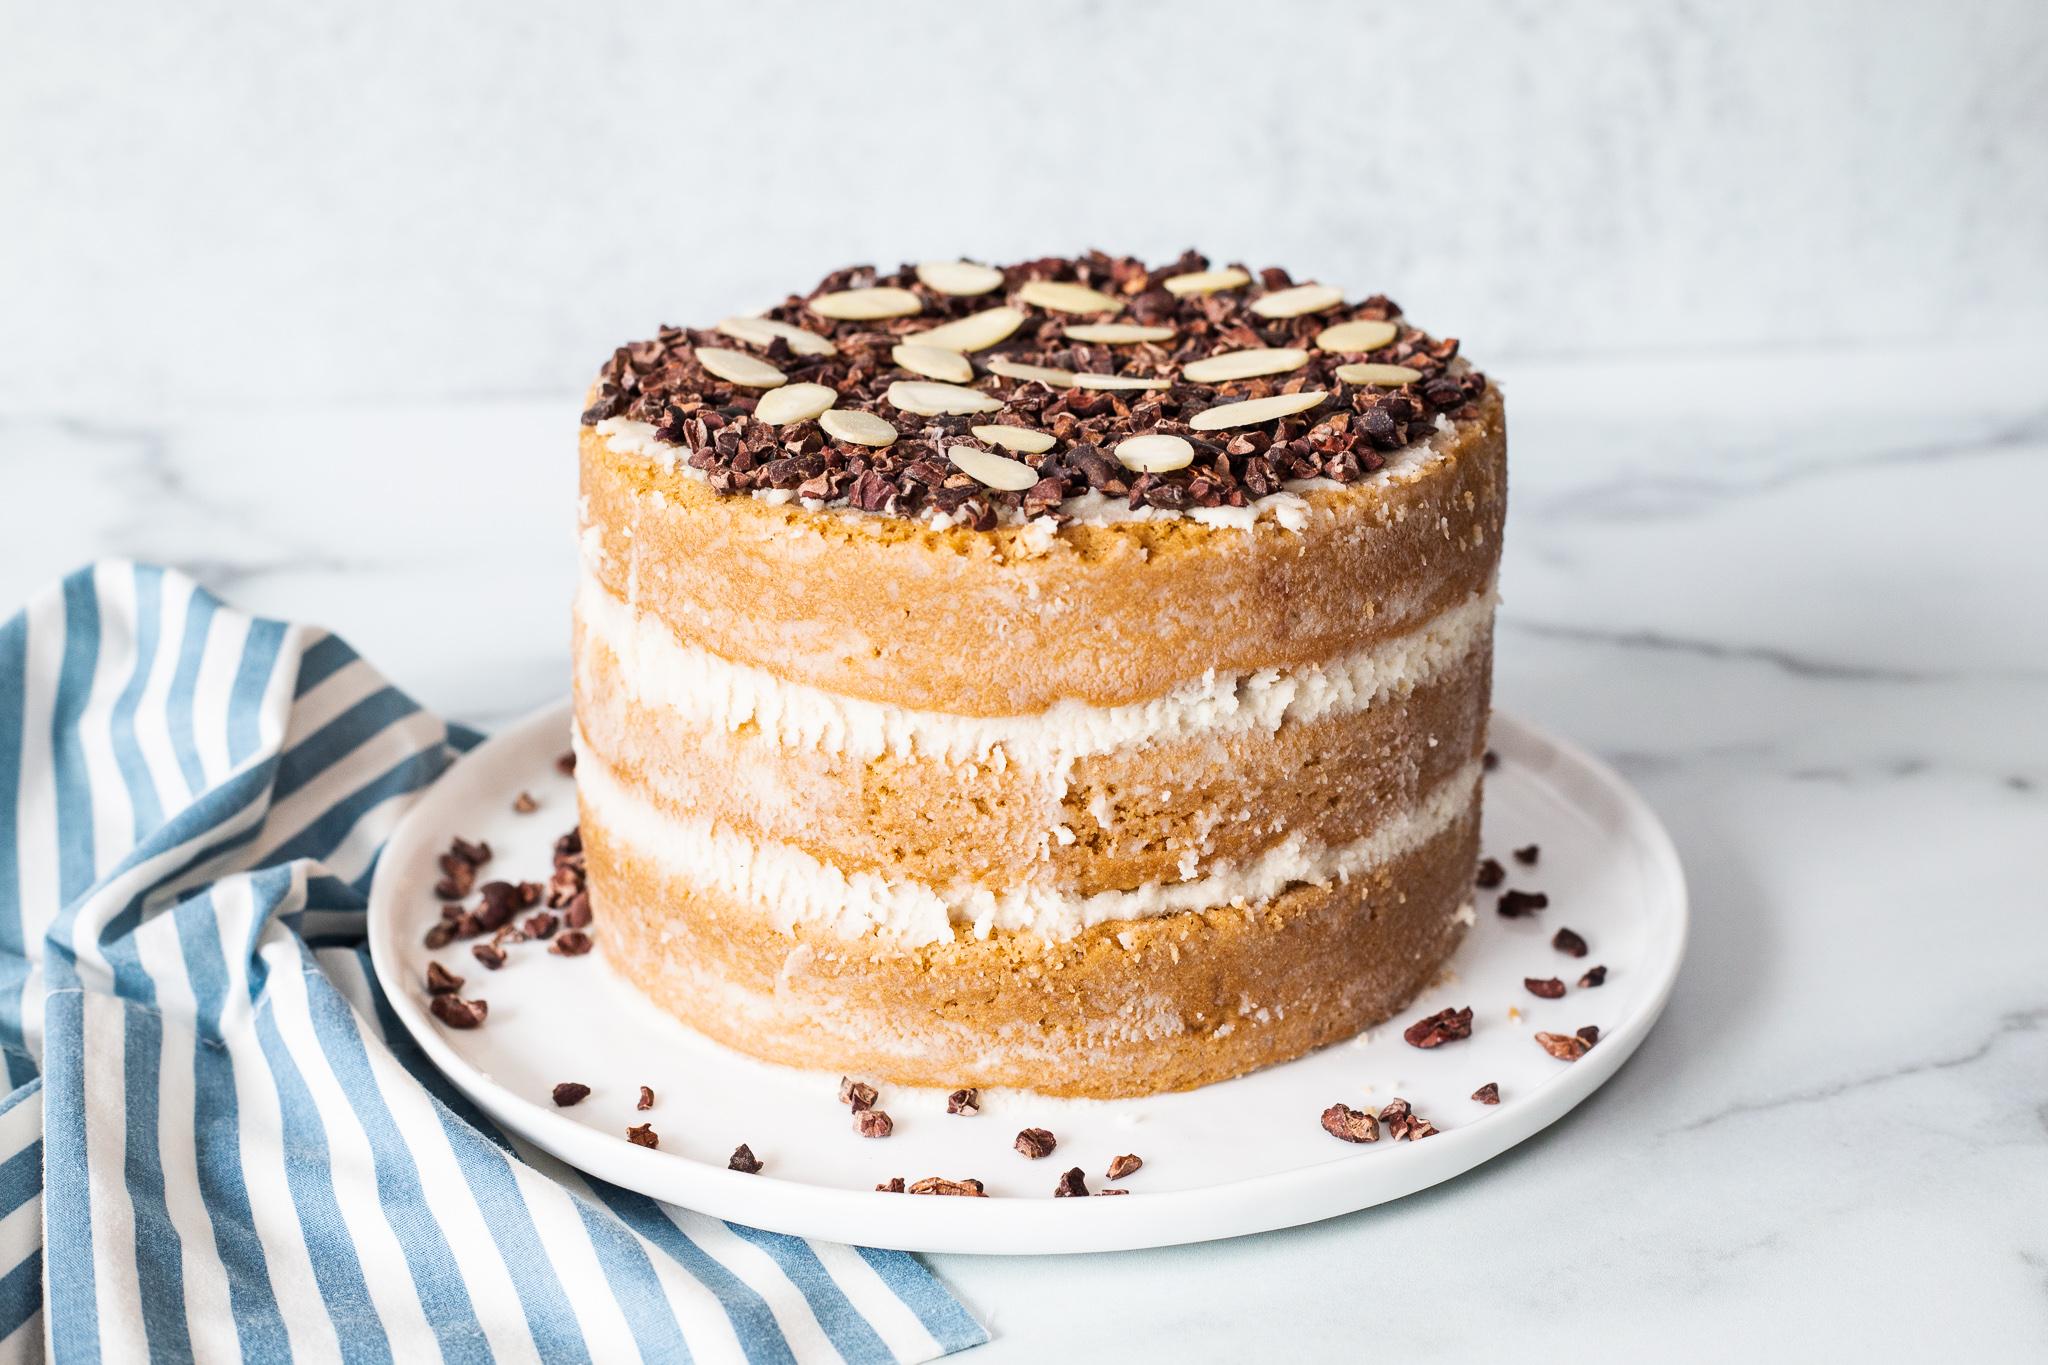 Paleo Chocolate Almond Cake; refined sugar free, gluten free, dairy free